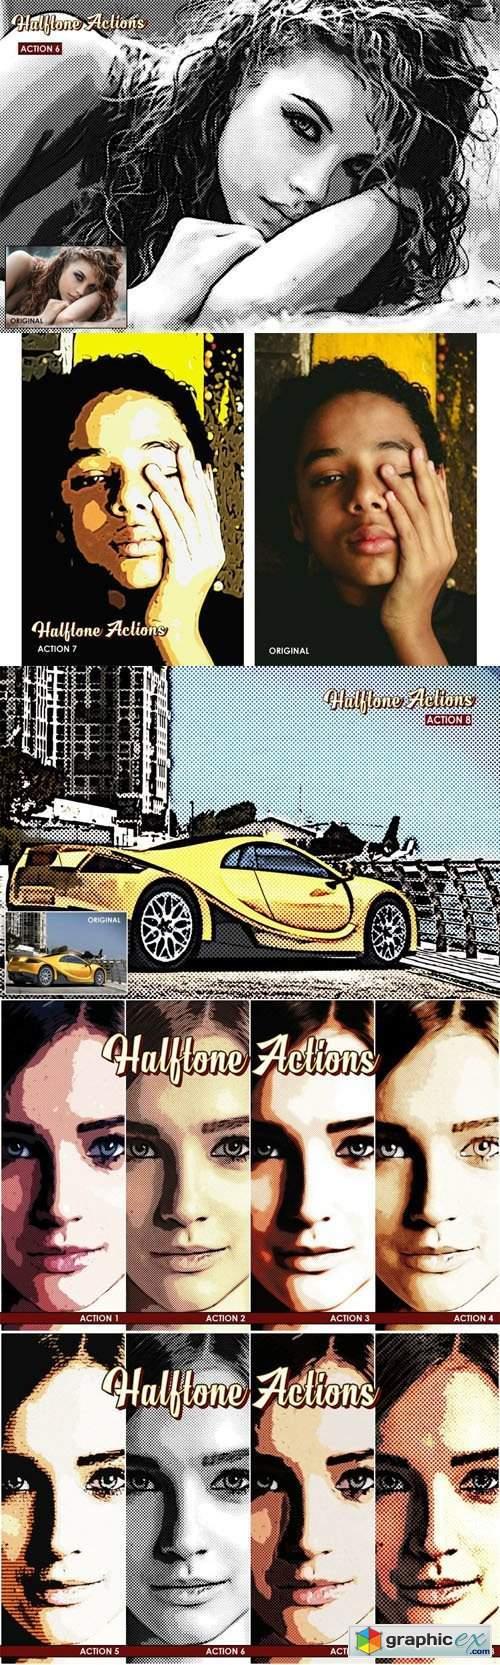 Halftone Photoshop Actions - Cartoonize Retro Style